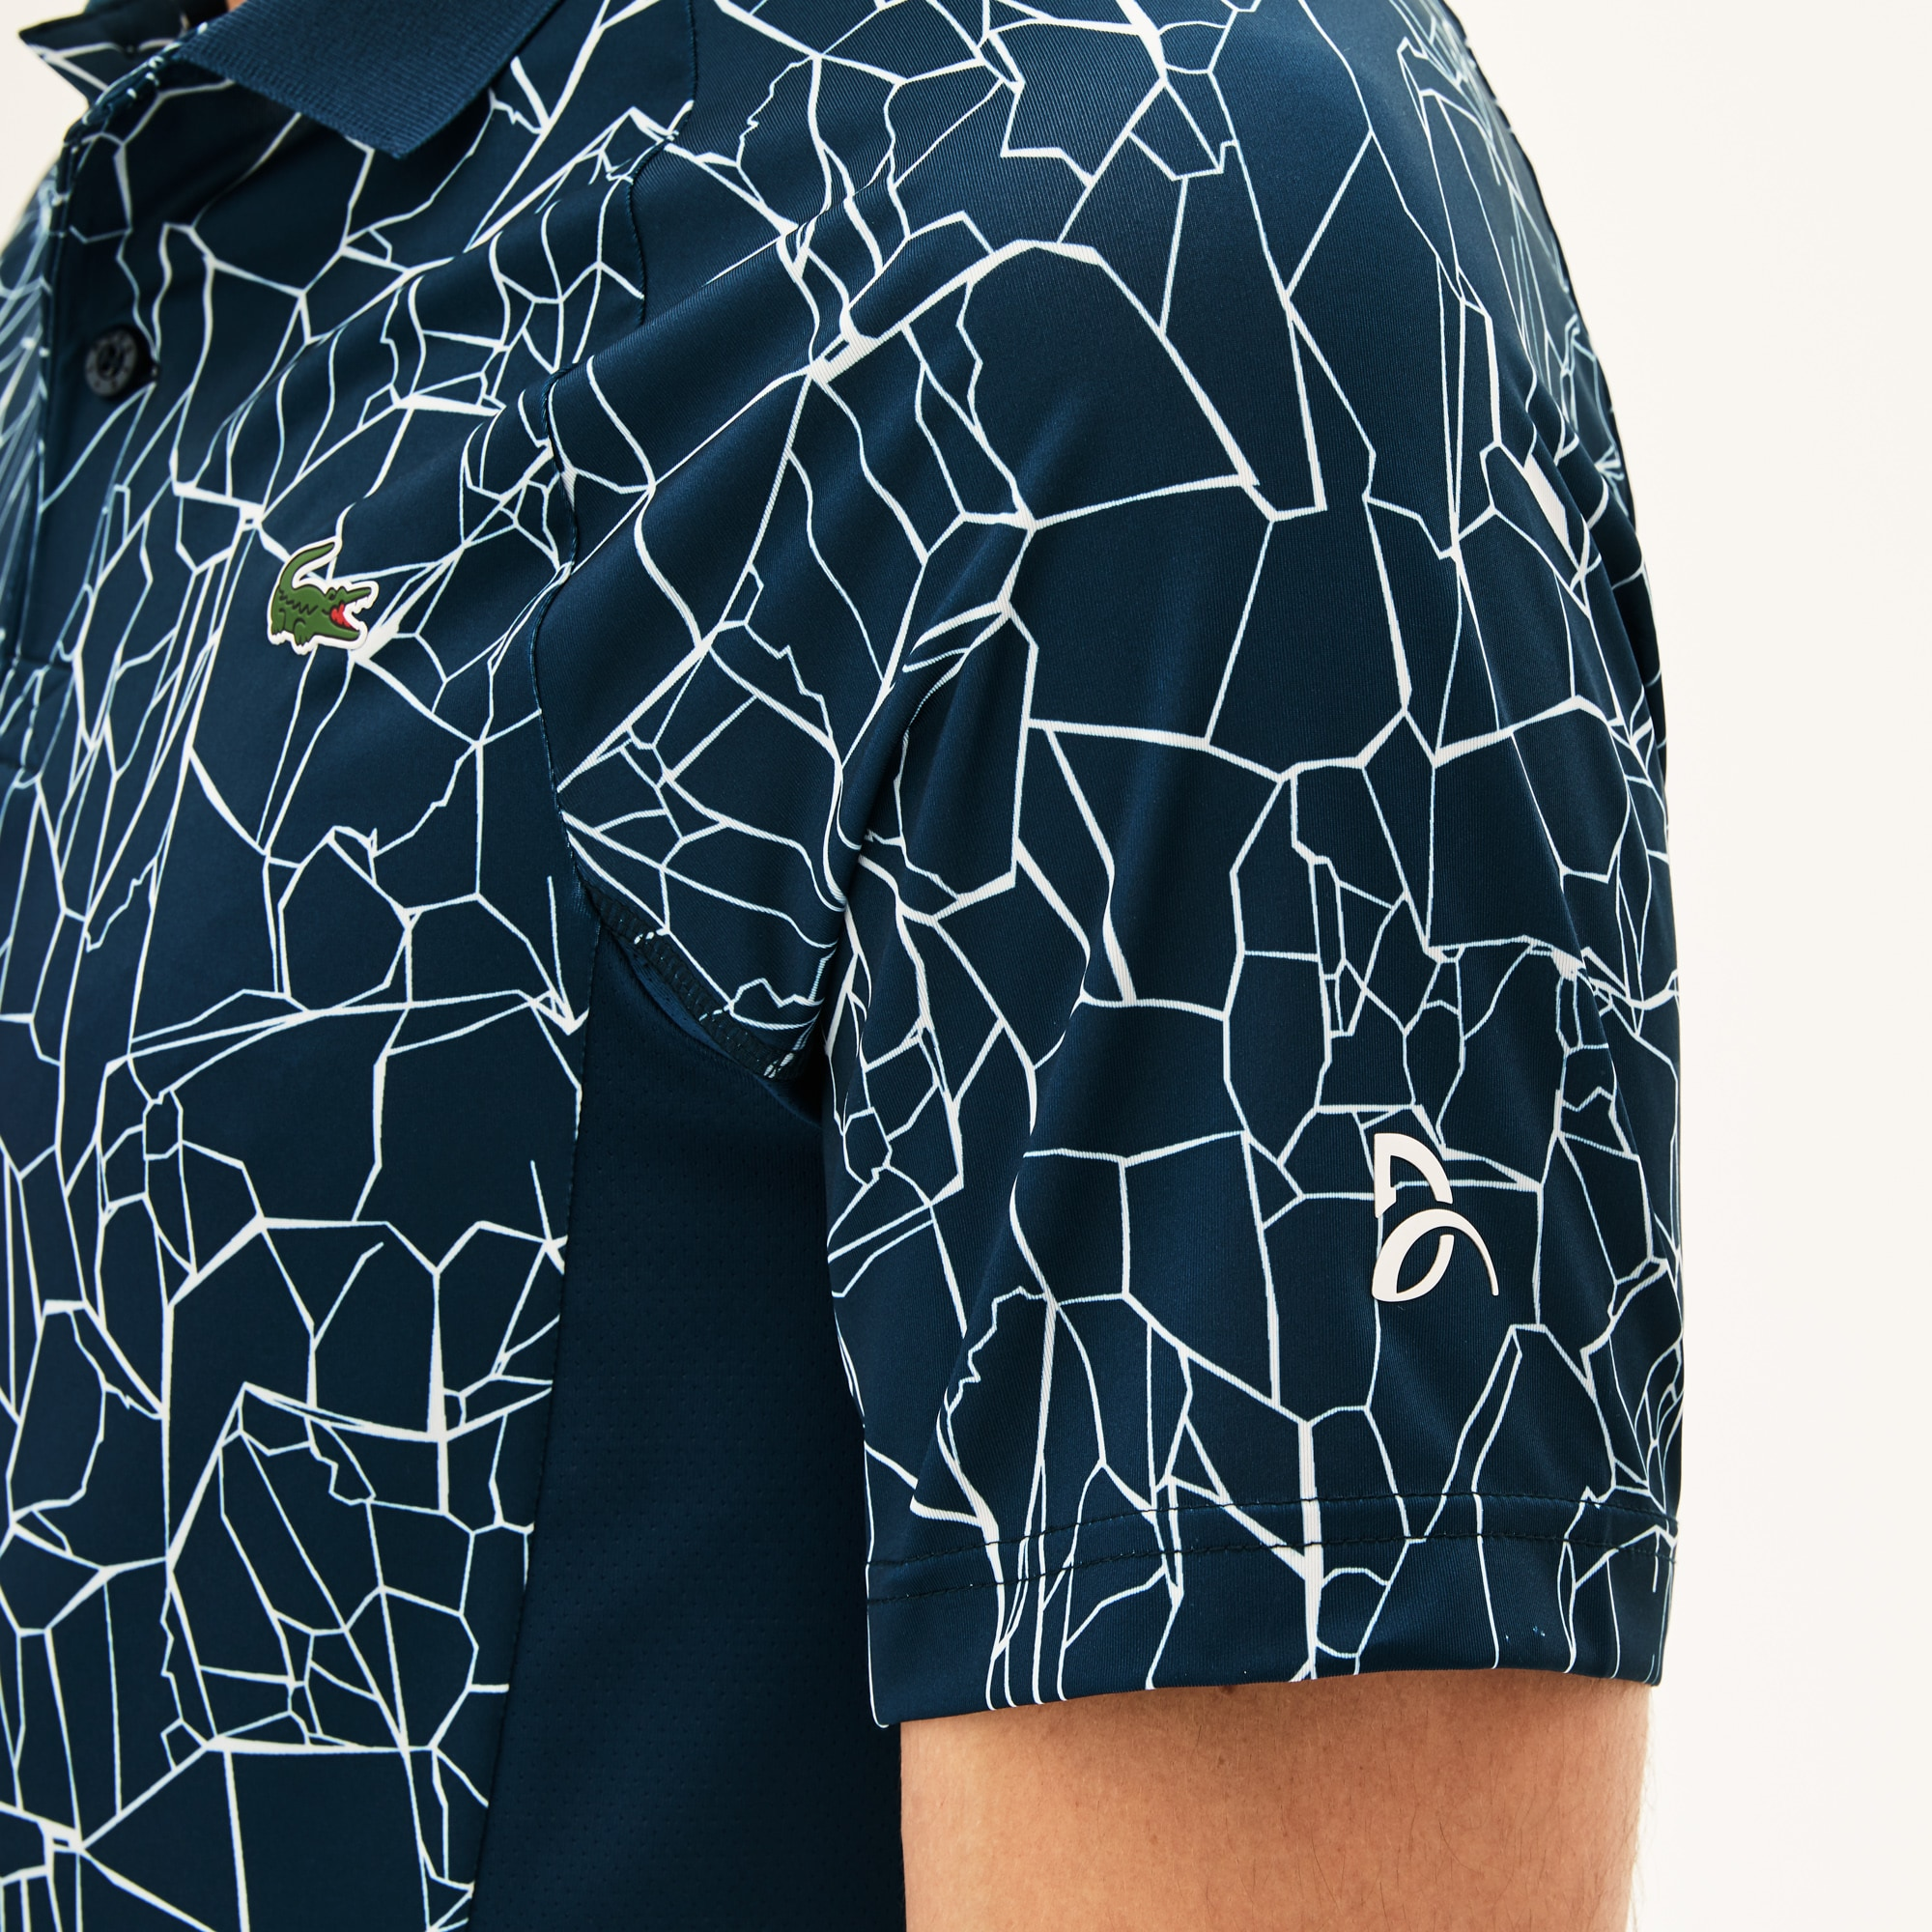 Lacoste - Herren-Poloshirt aus Jersey LACOSTE SPORT NOVAK DJOKOVIC - 5